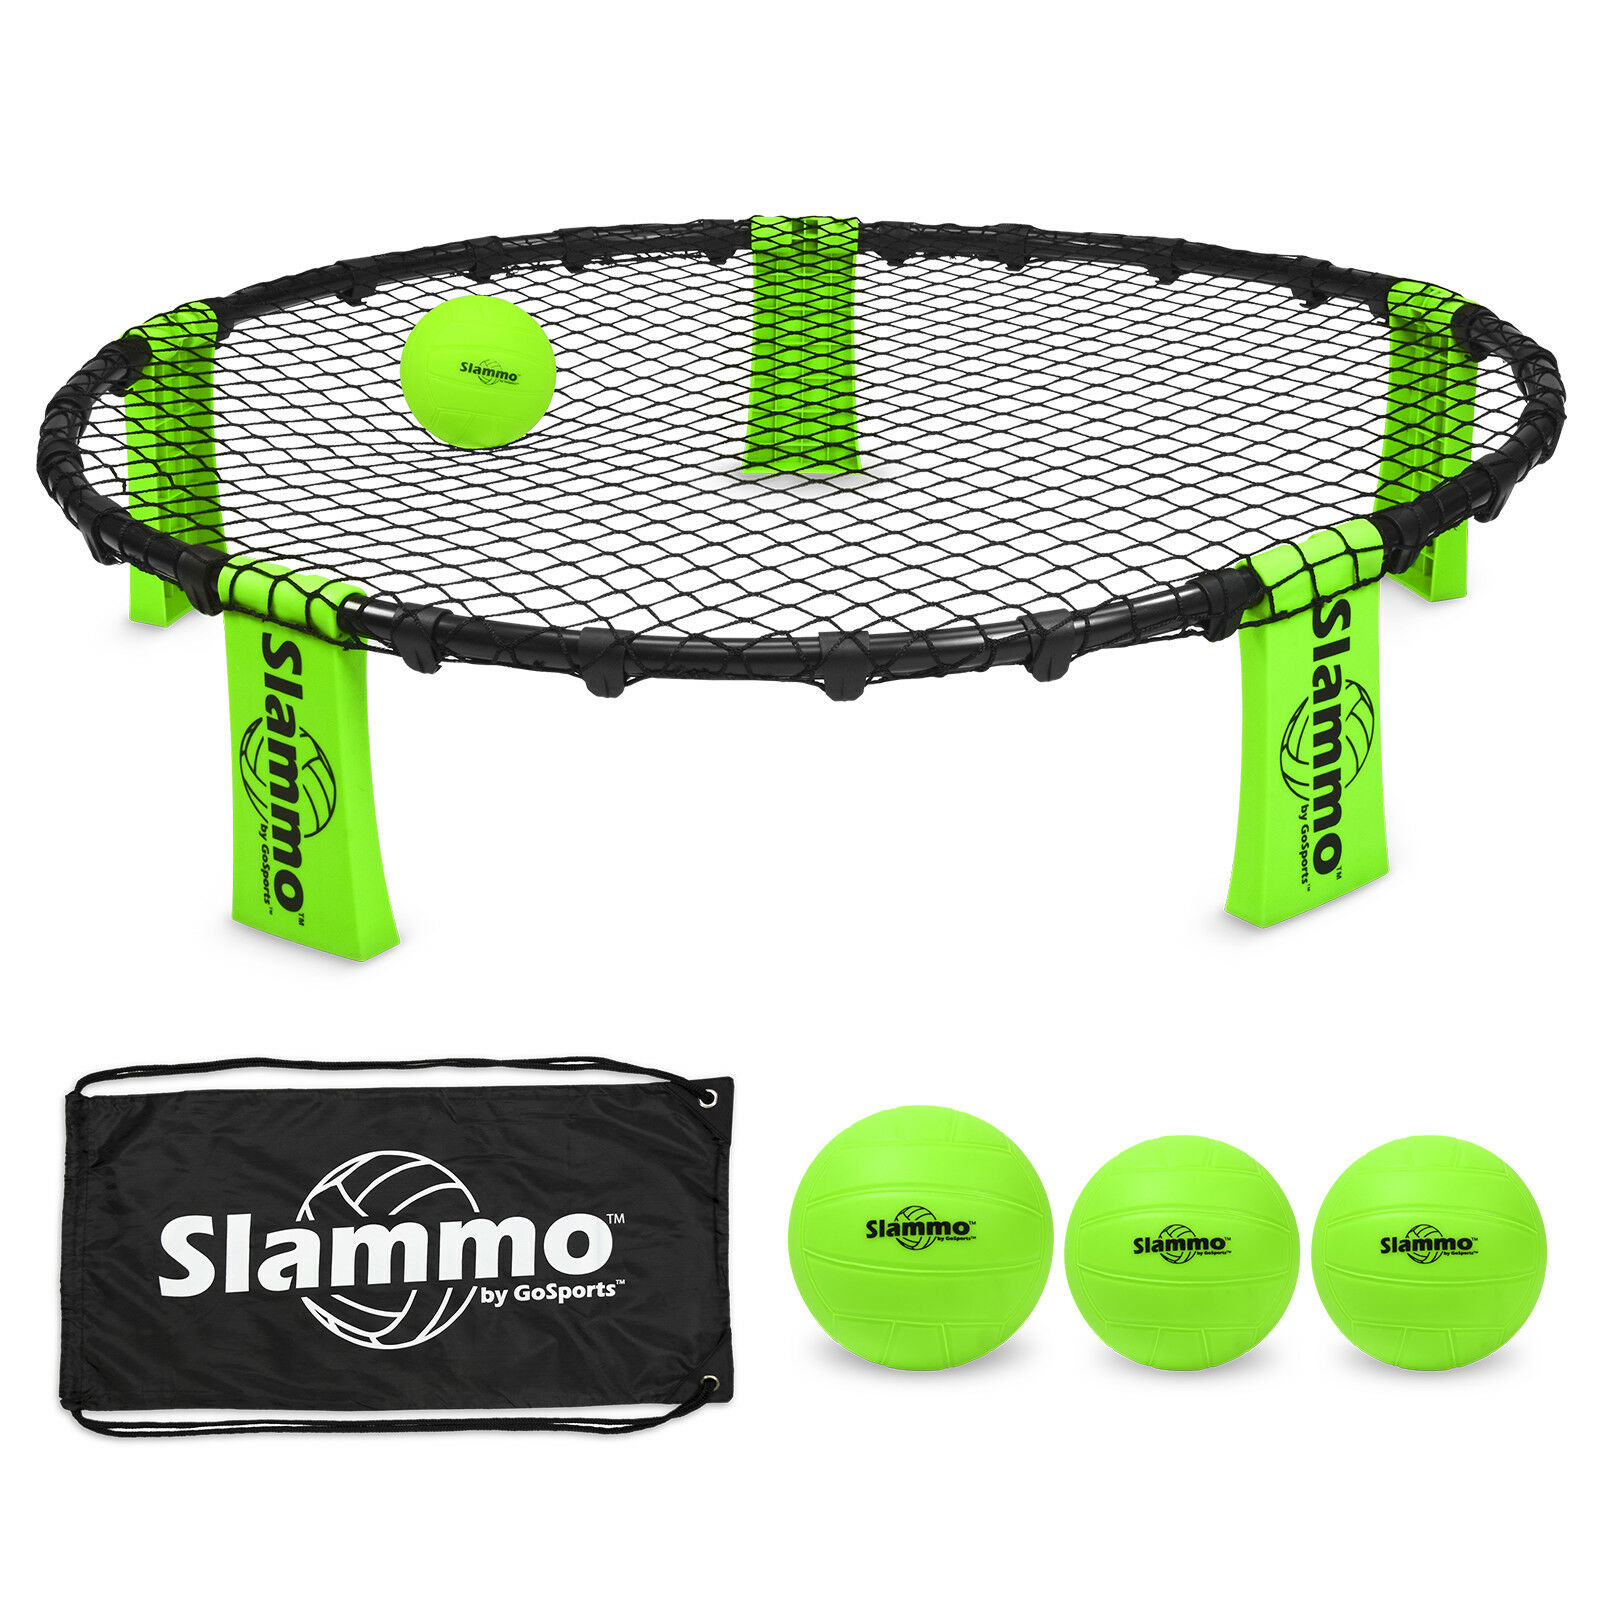 GoSports Slammo™ Game Combo Ball Set Drawstring Bag Four Square meets Volleyball